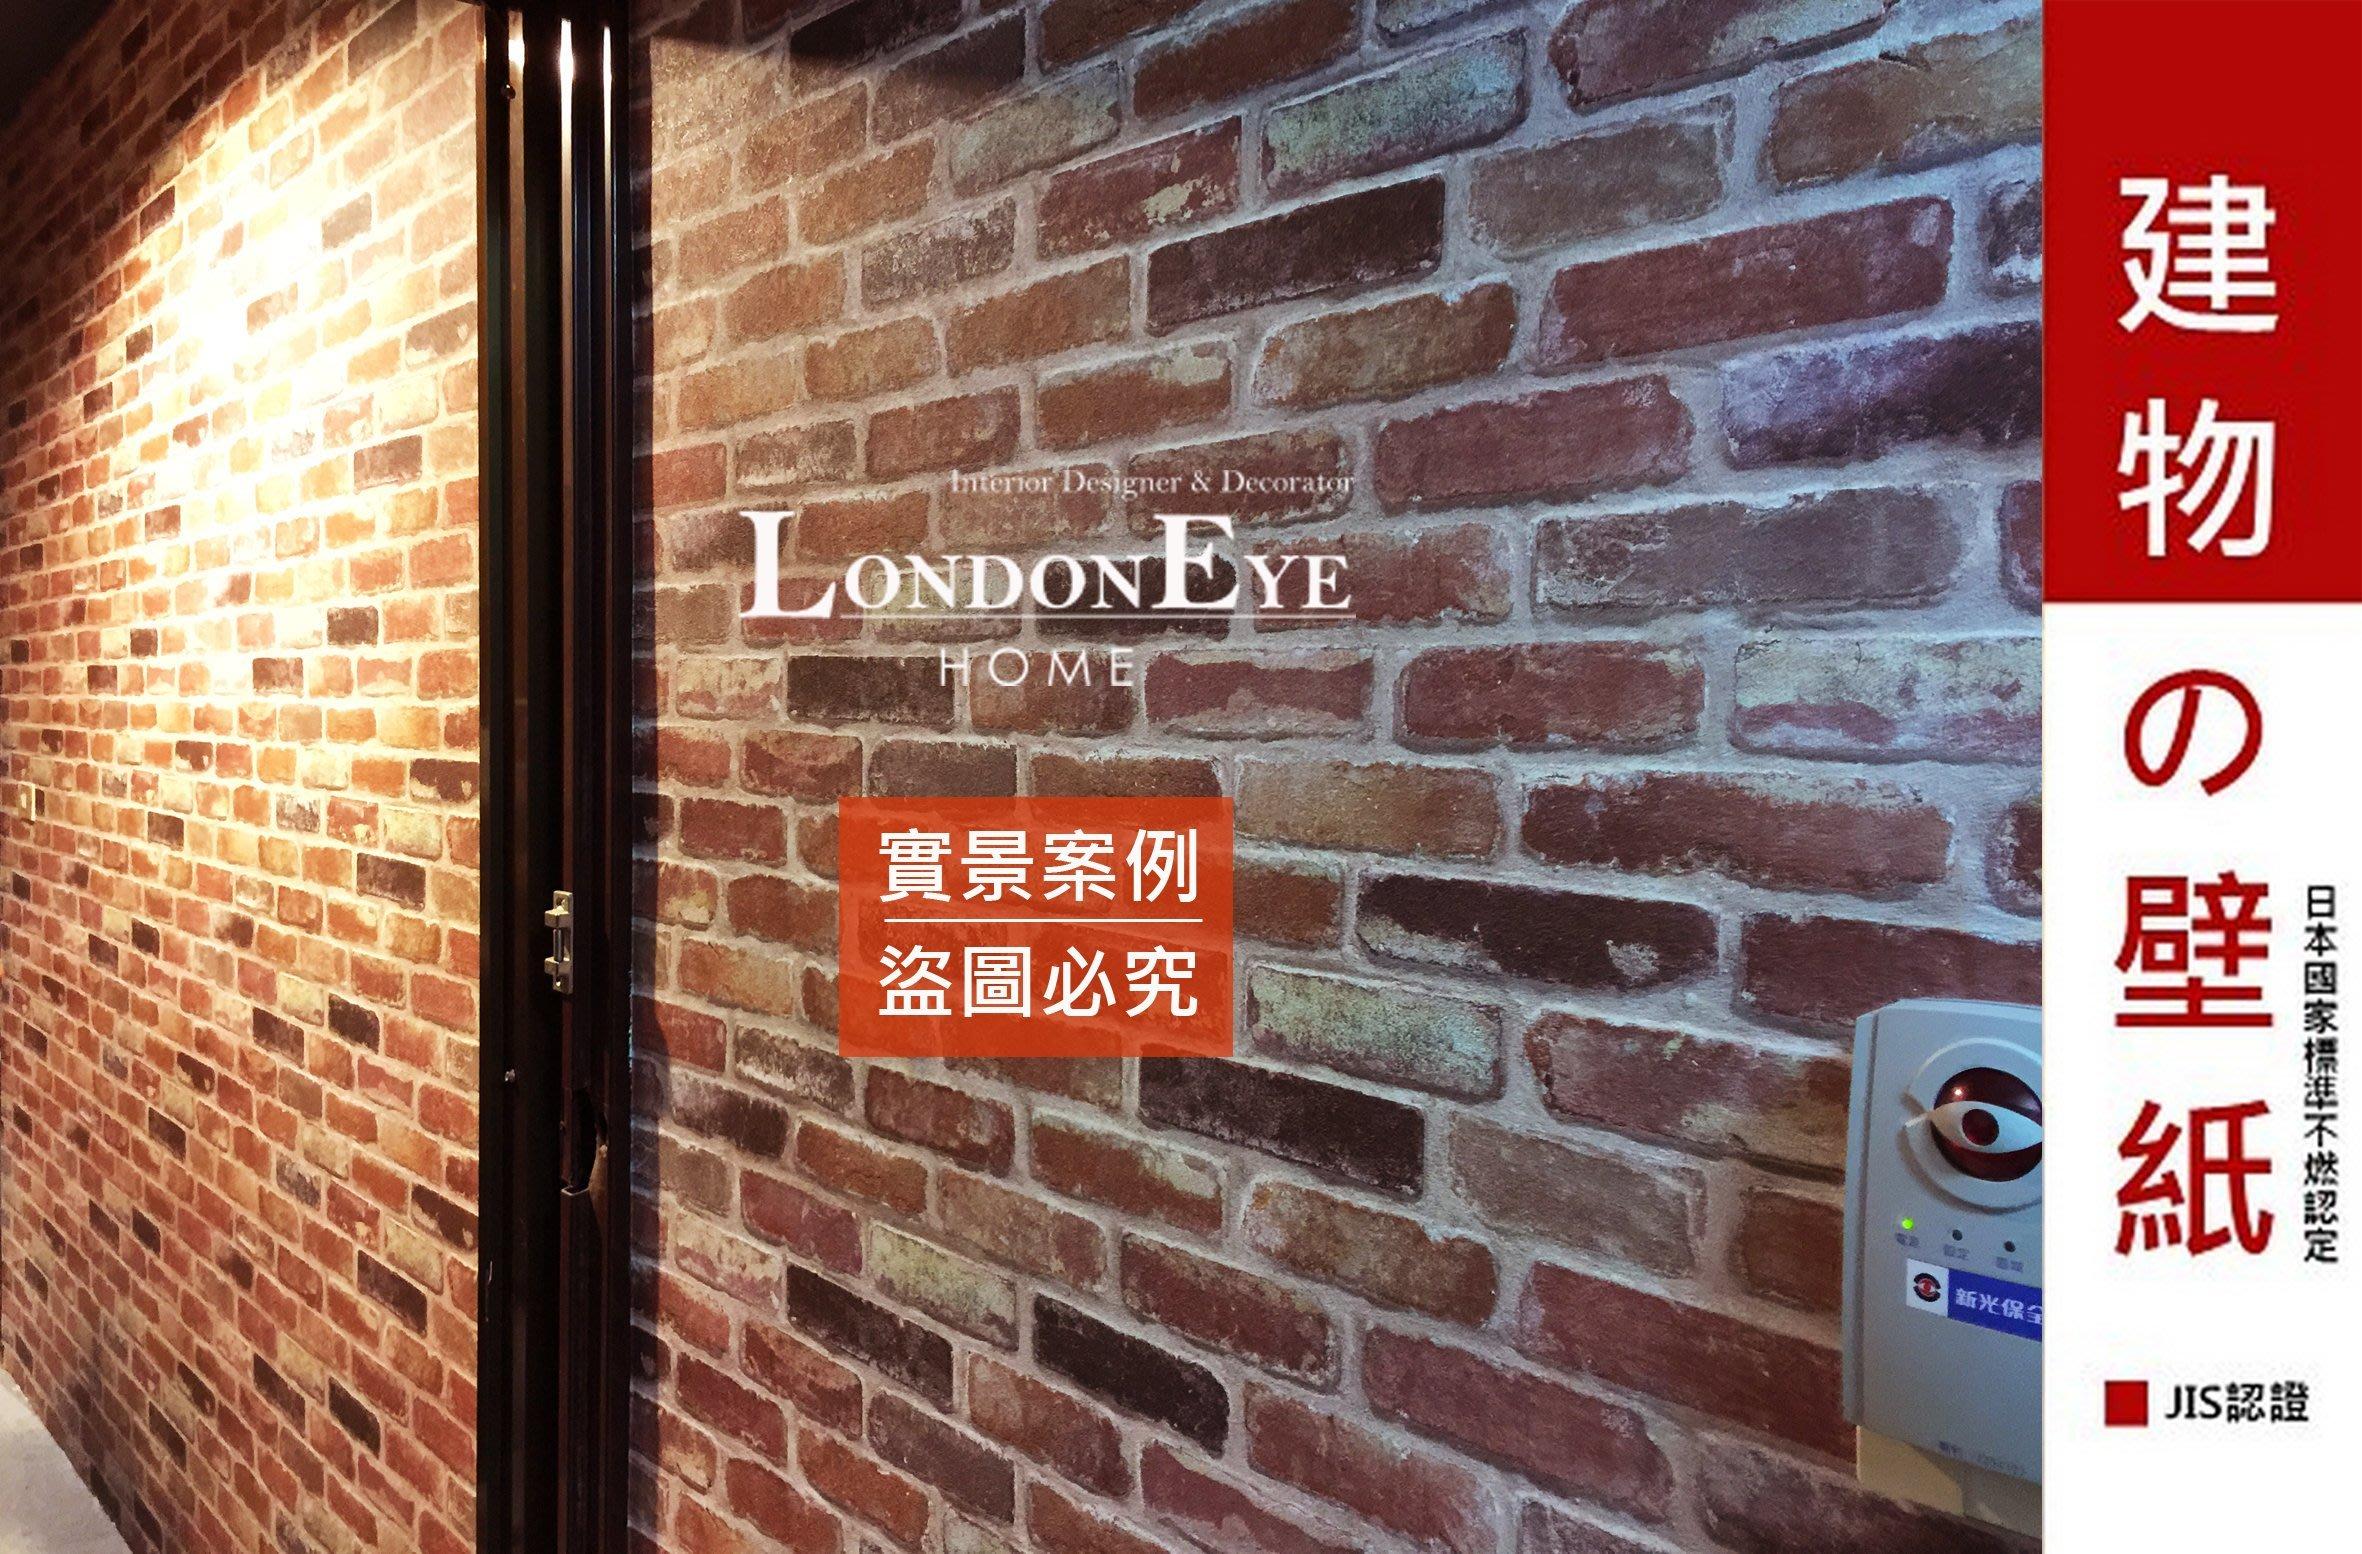 Londoneye Loft工業風 日本進口仿建材壁紙 重度紅磚x黑色異色系住宅